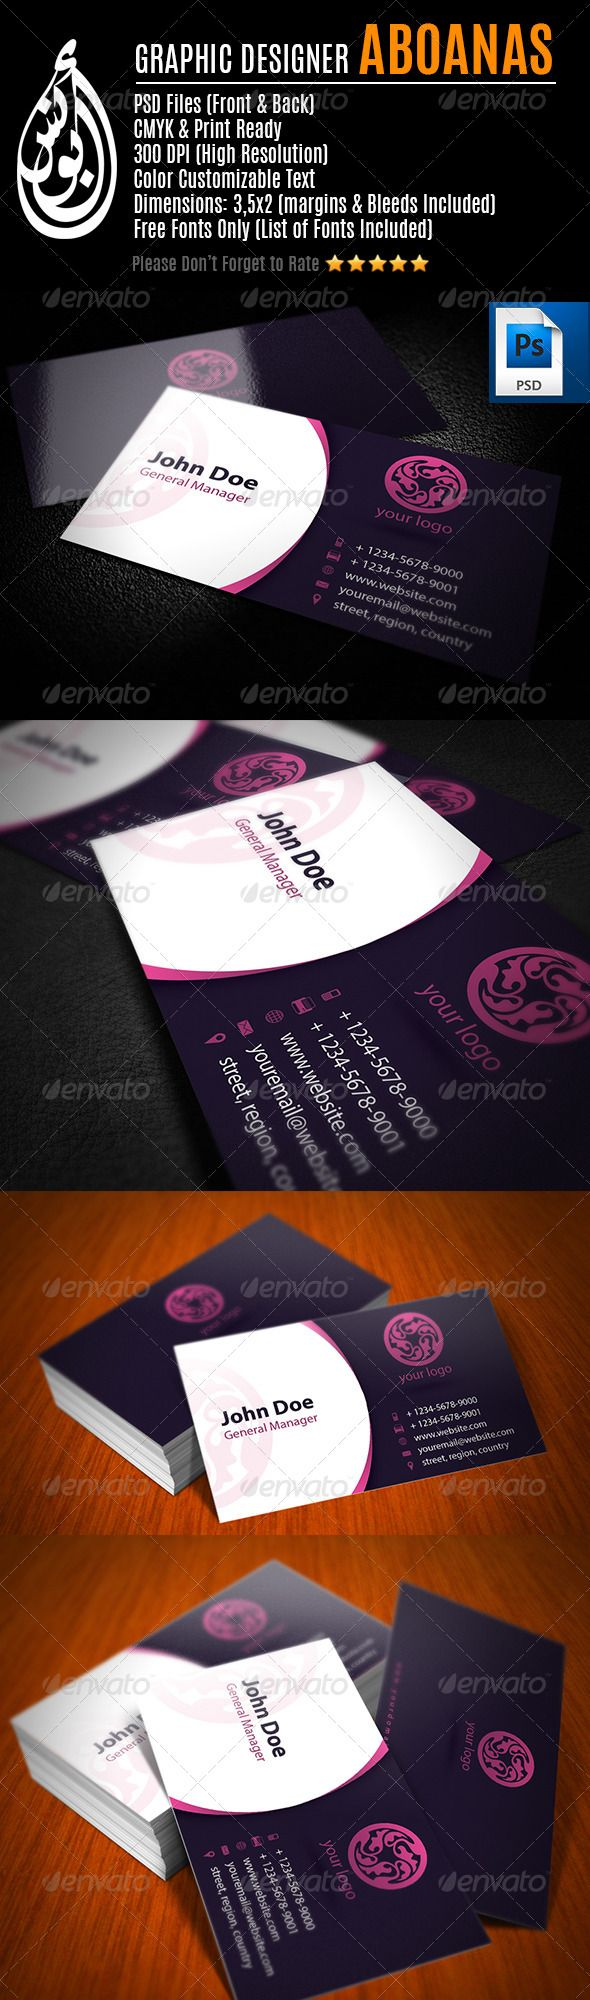 Realistic Graphic DOWNLOAD (.ai, .psd) :: http://vector-graphic.de ...